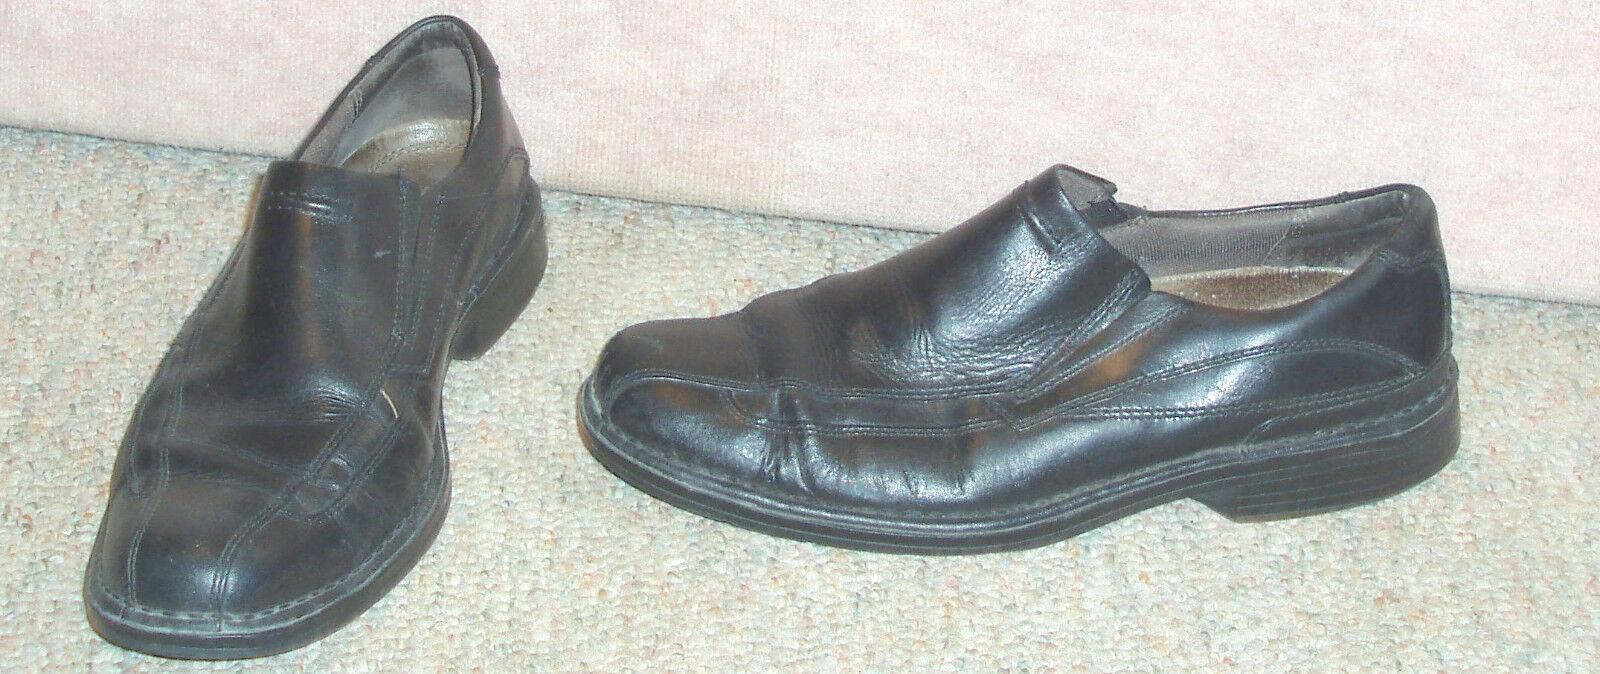 Men's black leather upper loafers CLARKS slip on  loafers upper / shoes  , sz  9 M 7123f7